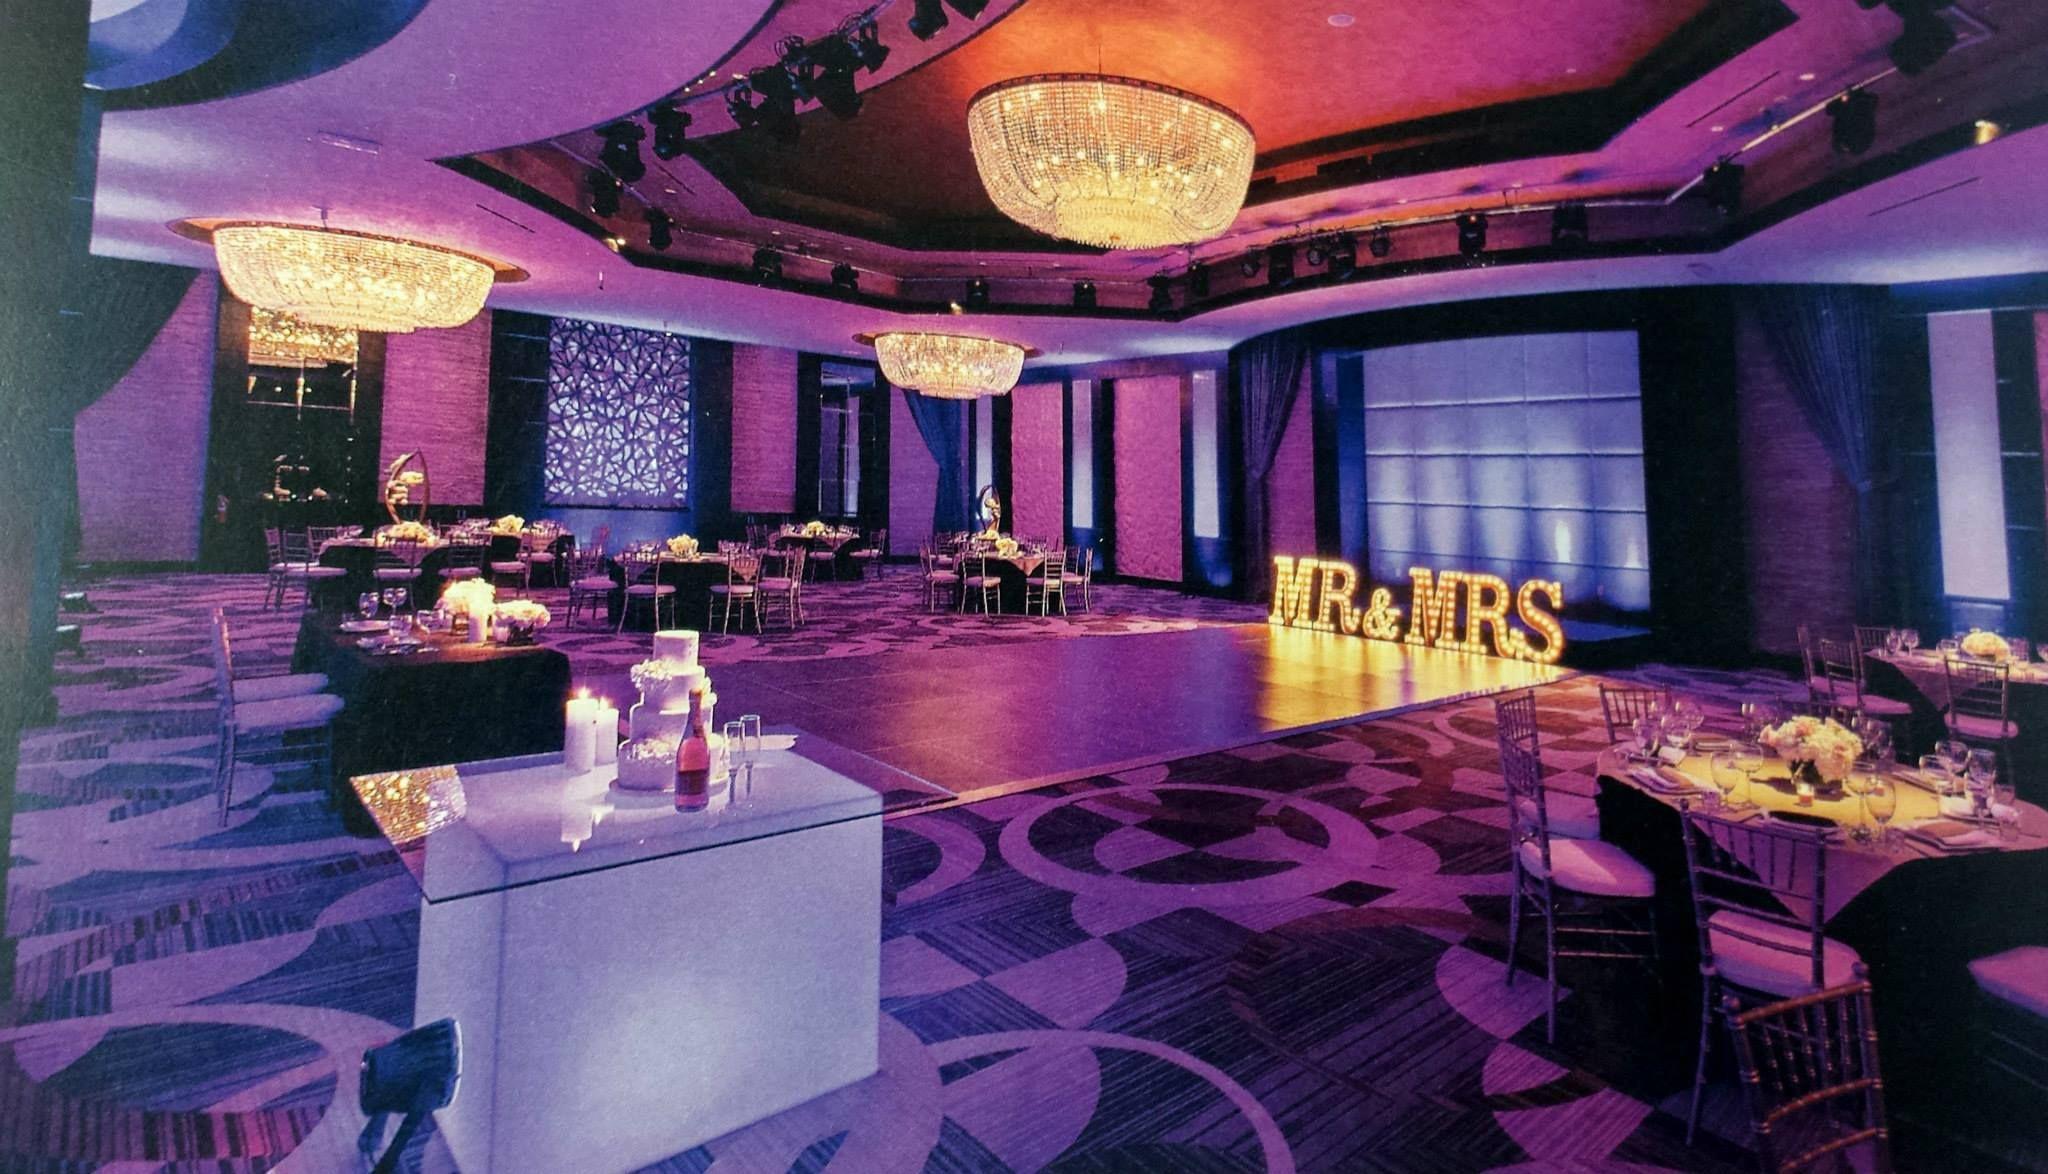 Fabrizio Las Vegas Banquet Hall Las Vegas Weddings